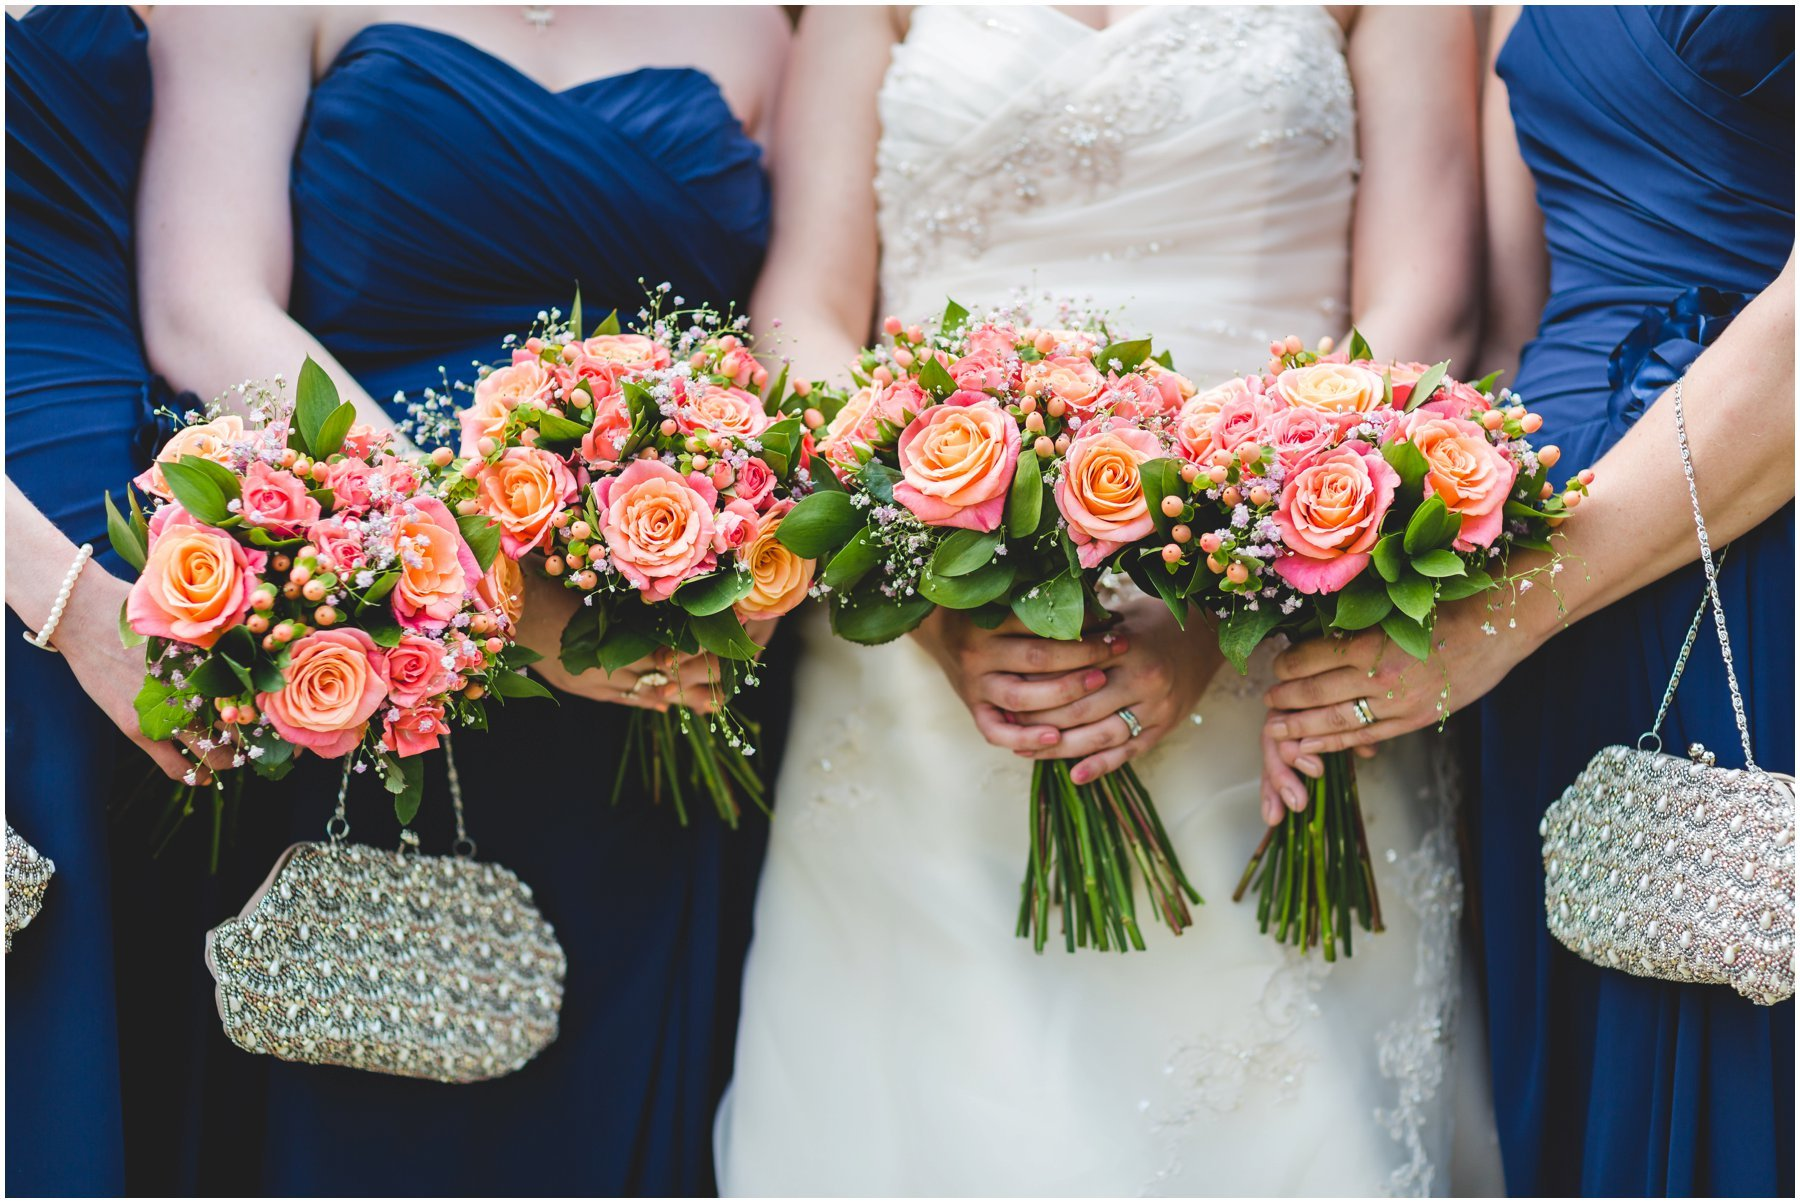 HAUTBOIS HALL WEDDING - CAROLINE AND JON - NORFOLK WEDDING PHOTOGRAPHER 1